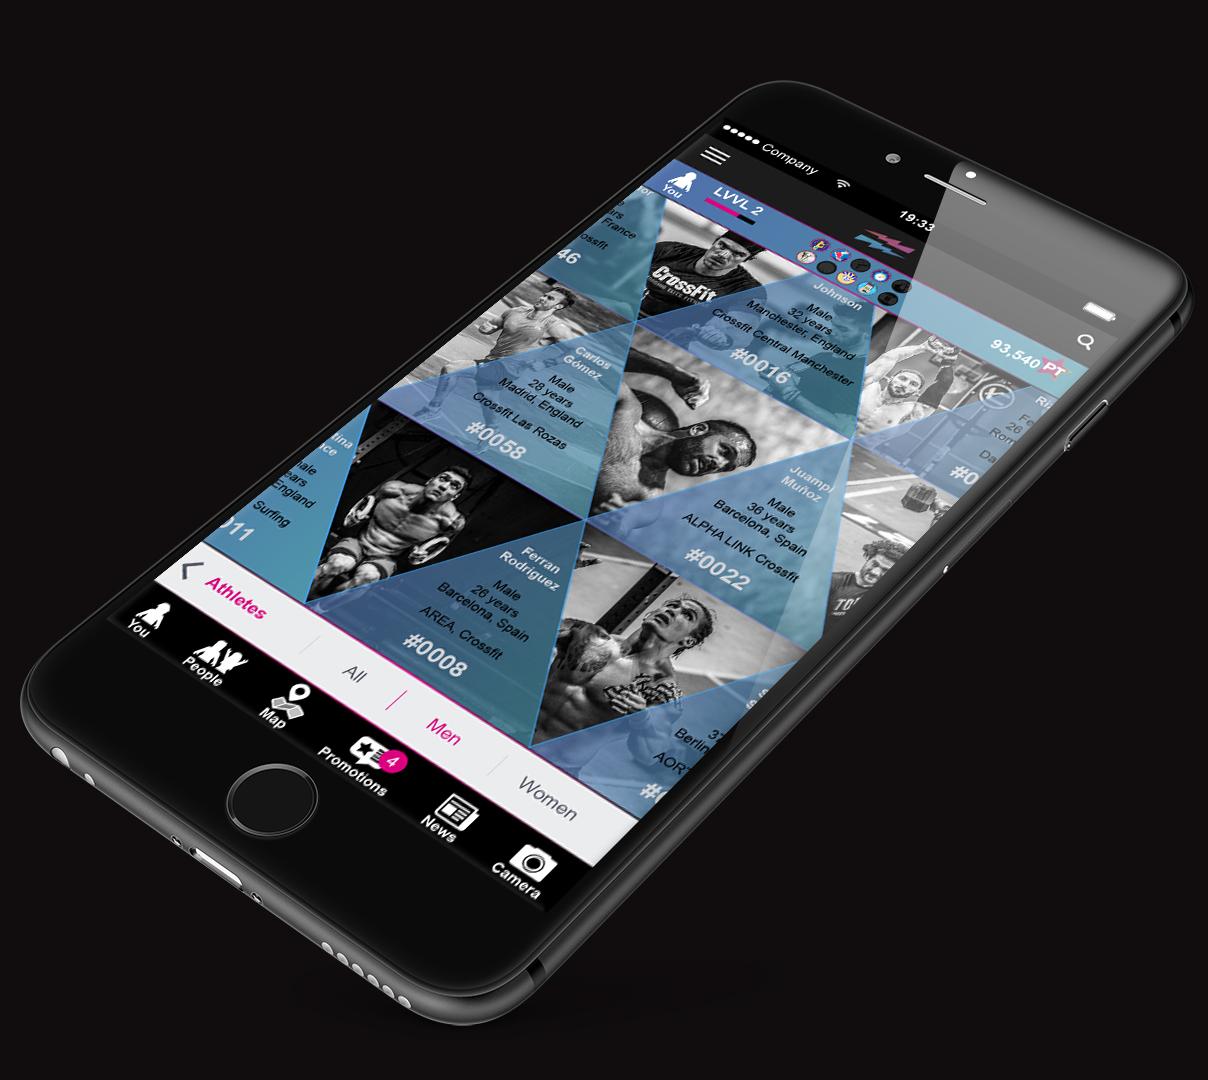 LEVVEL iPhone_Plus_app_competition_athletes men.jpg